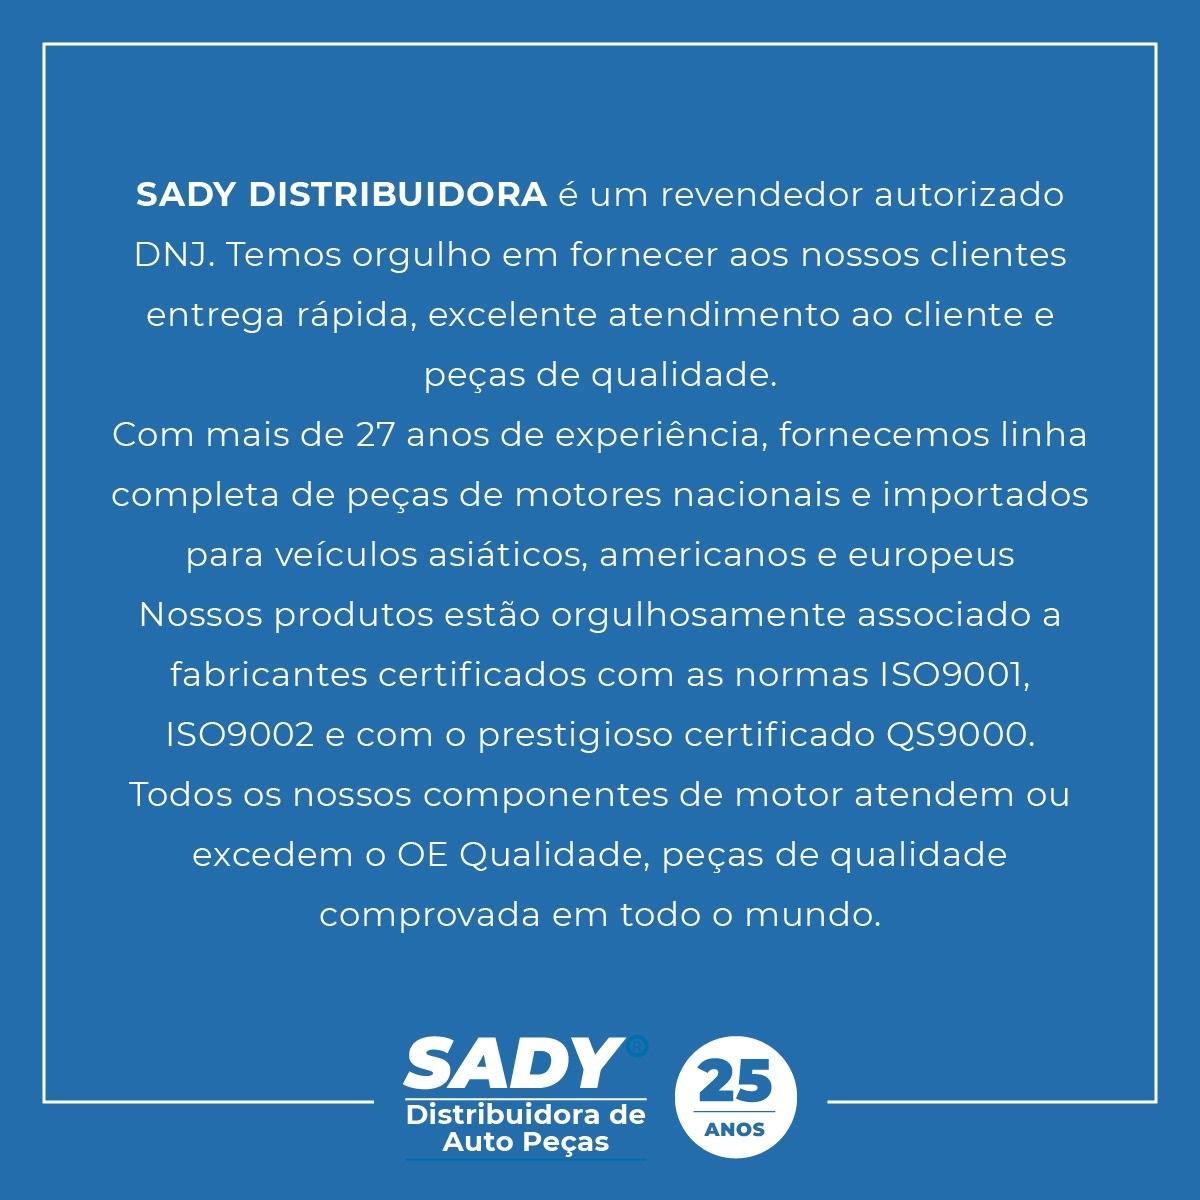 BOMBA DE OLEO DO MOTOR ISUZU 4.3D 8V 4HF1